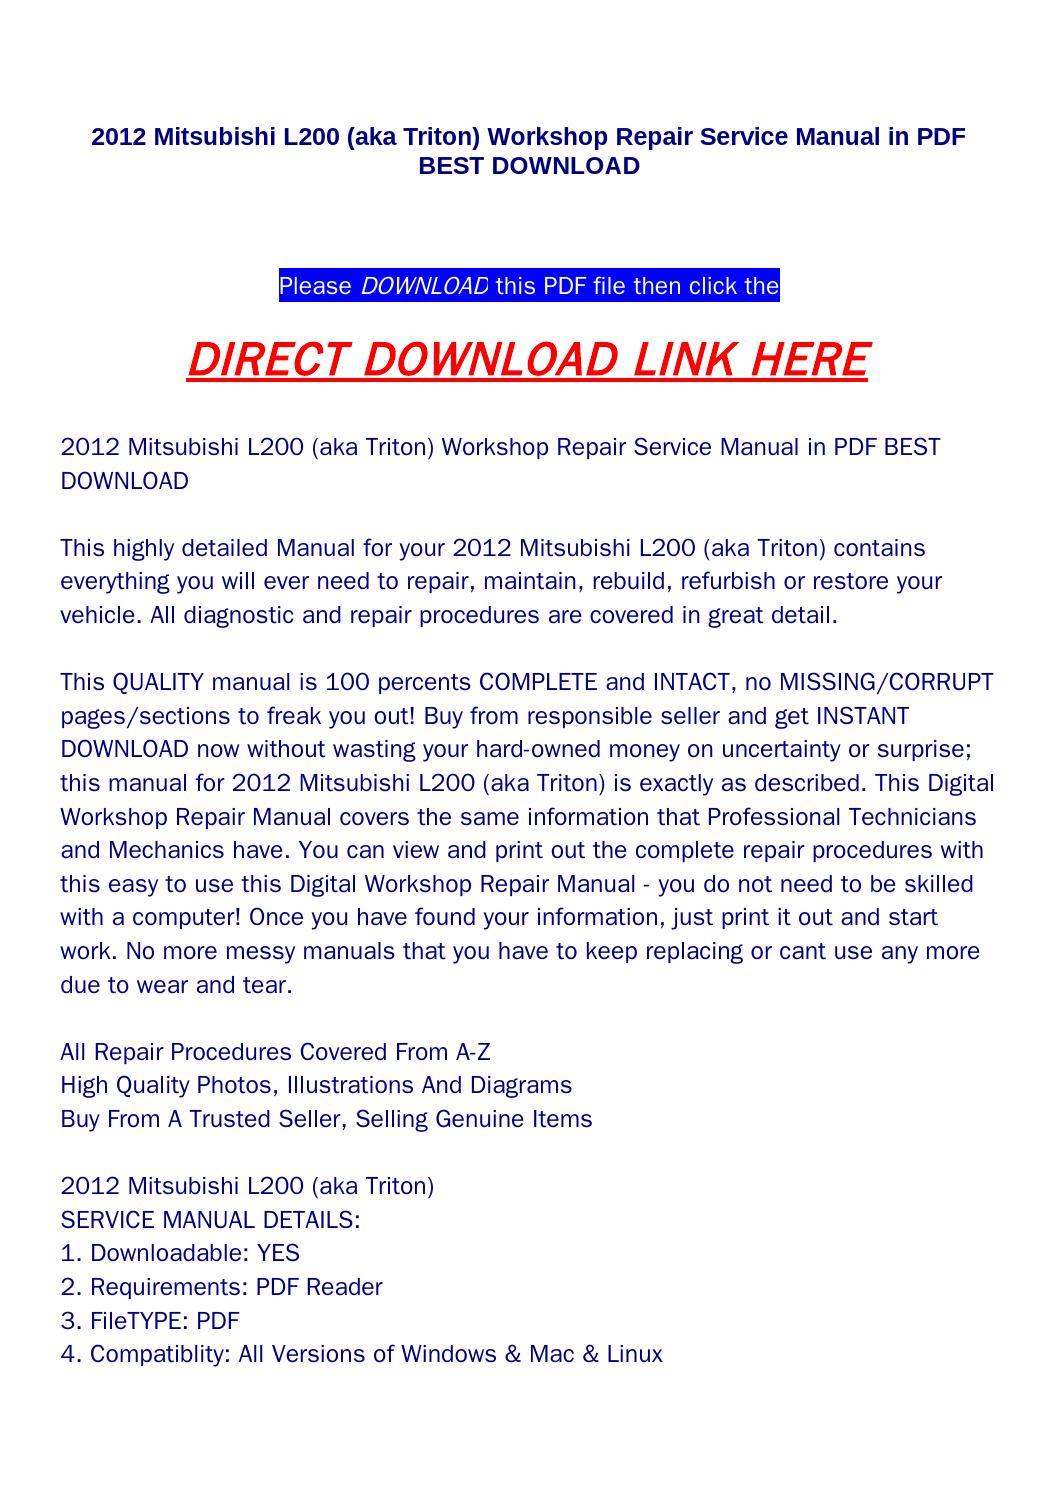 mitsubishi triton wiring diagram wiper motor 2012 l200 aka workshop repair service